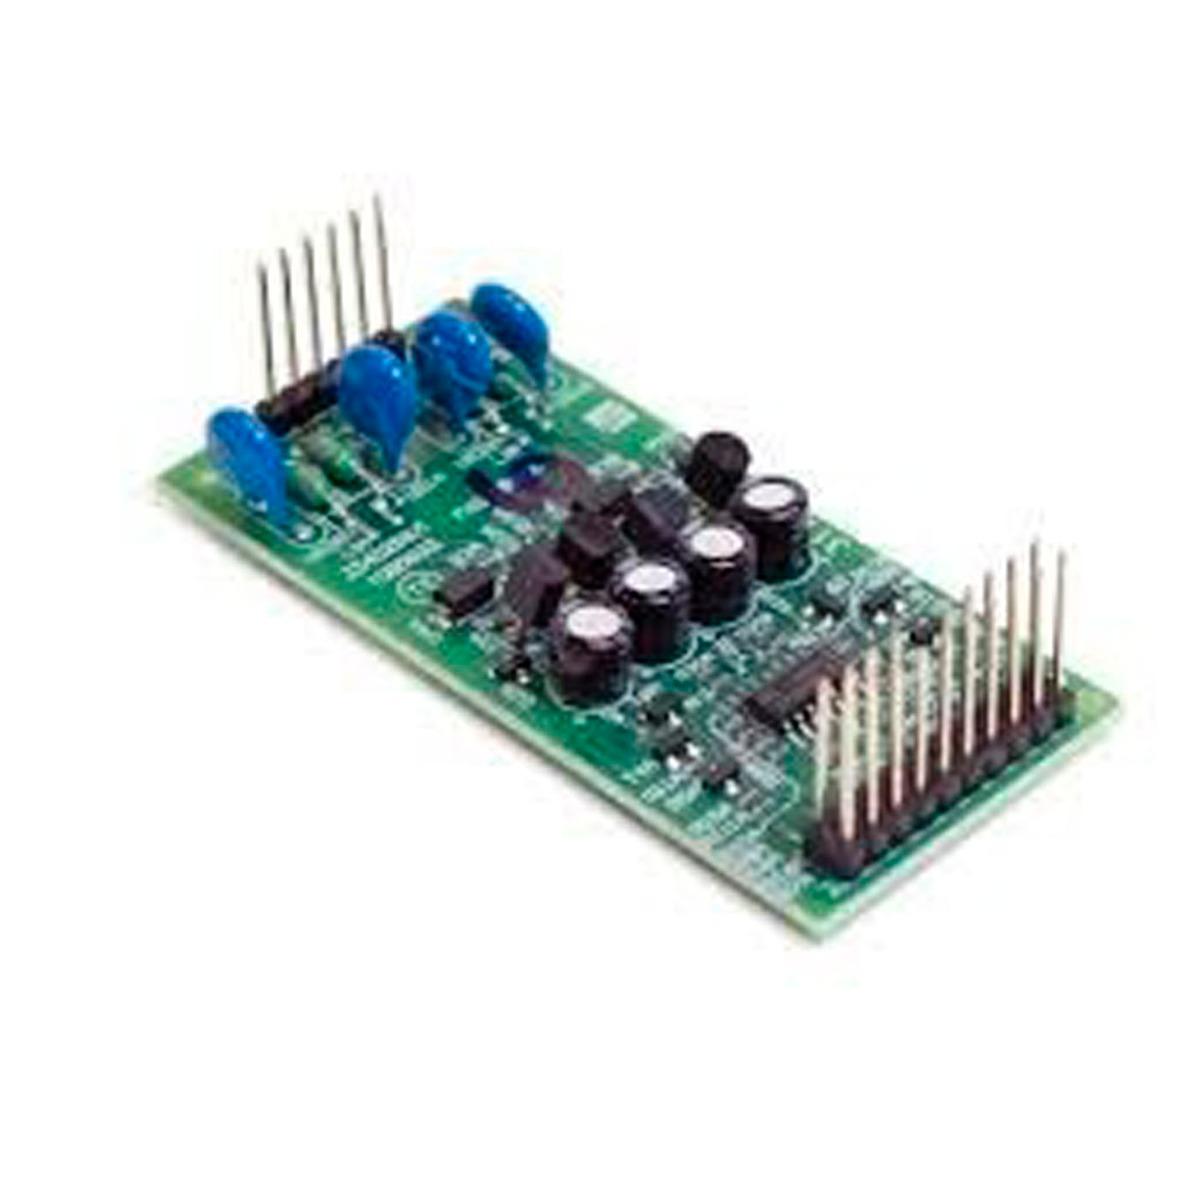 Placa Intelbras Fxs Cip 850 - Ramal